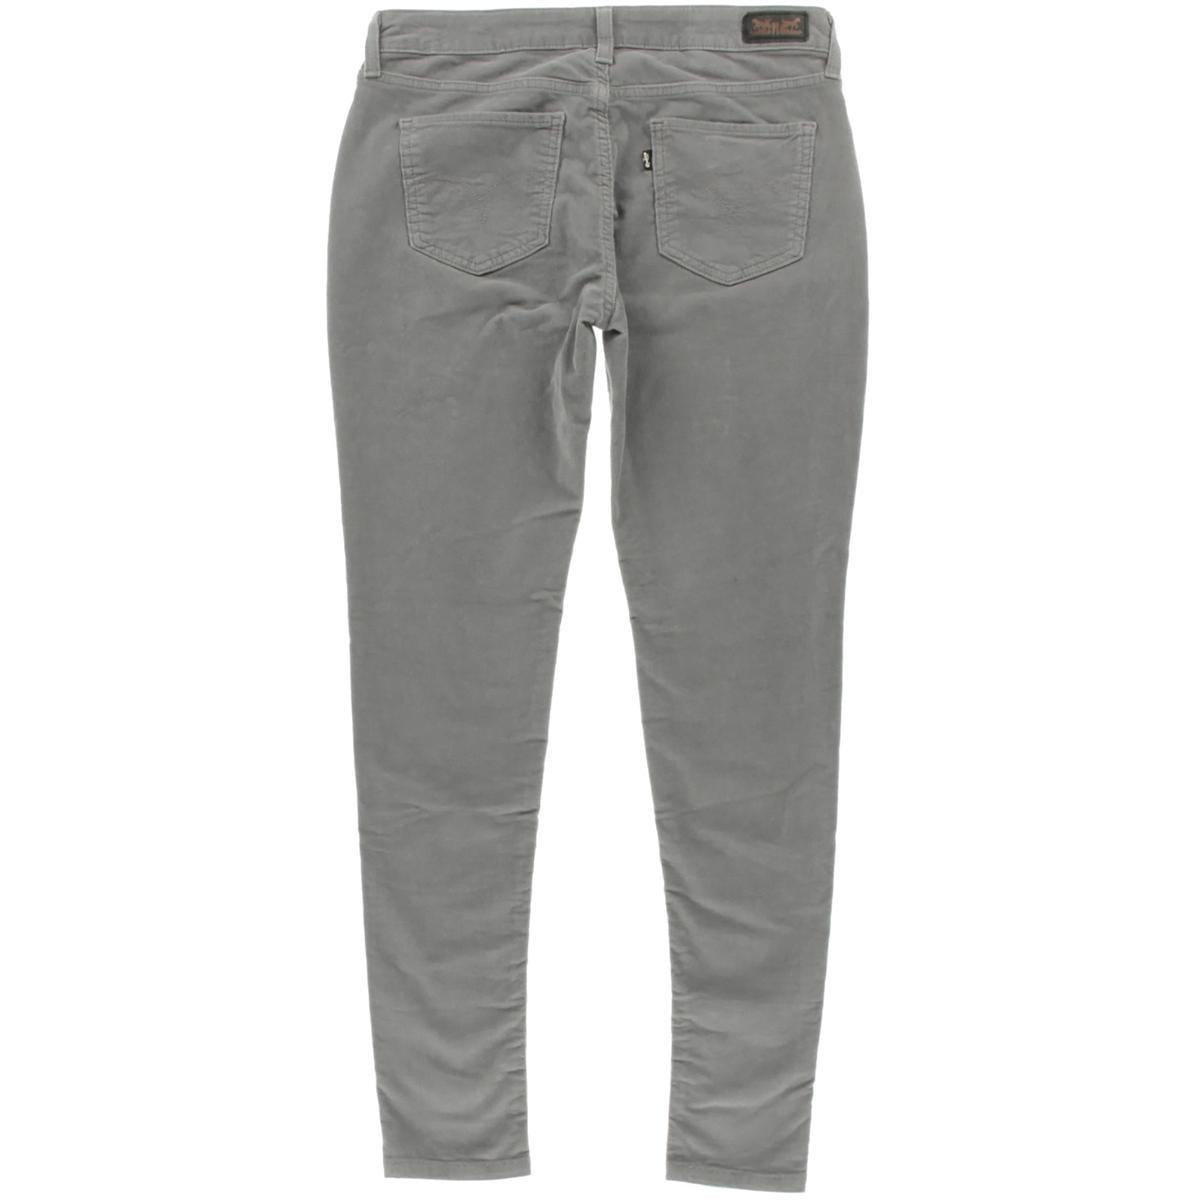 Levi's Womens Juniors Corduroy Legging Corduroy Pants - Walmart.com